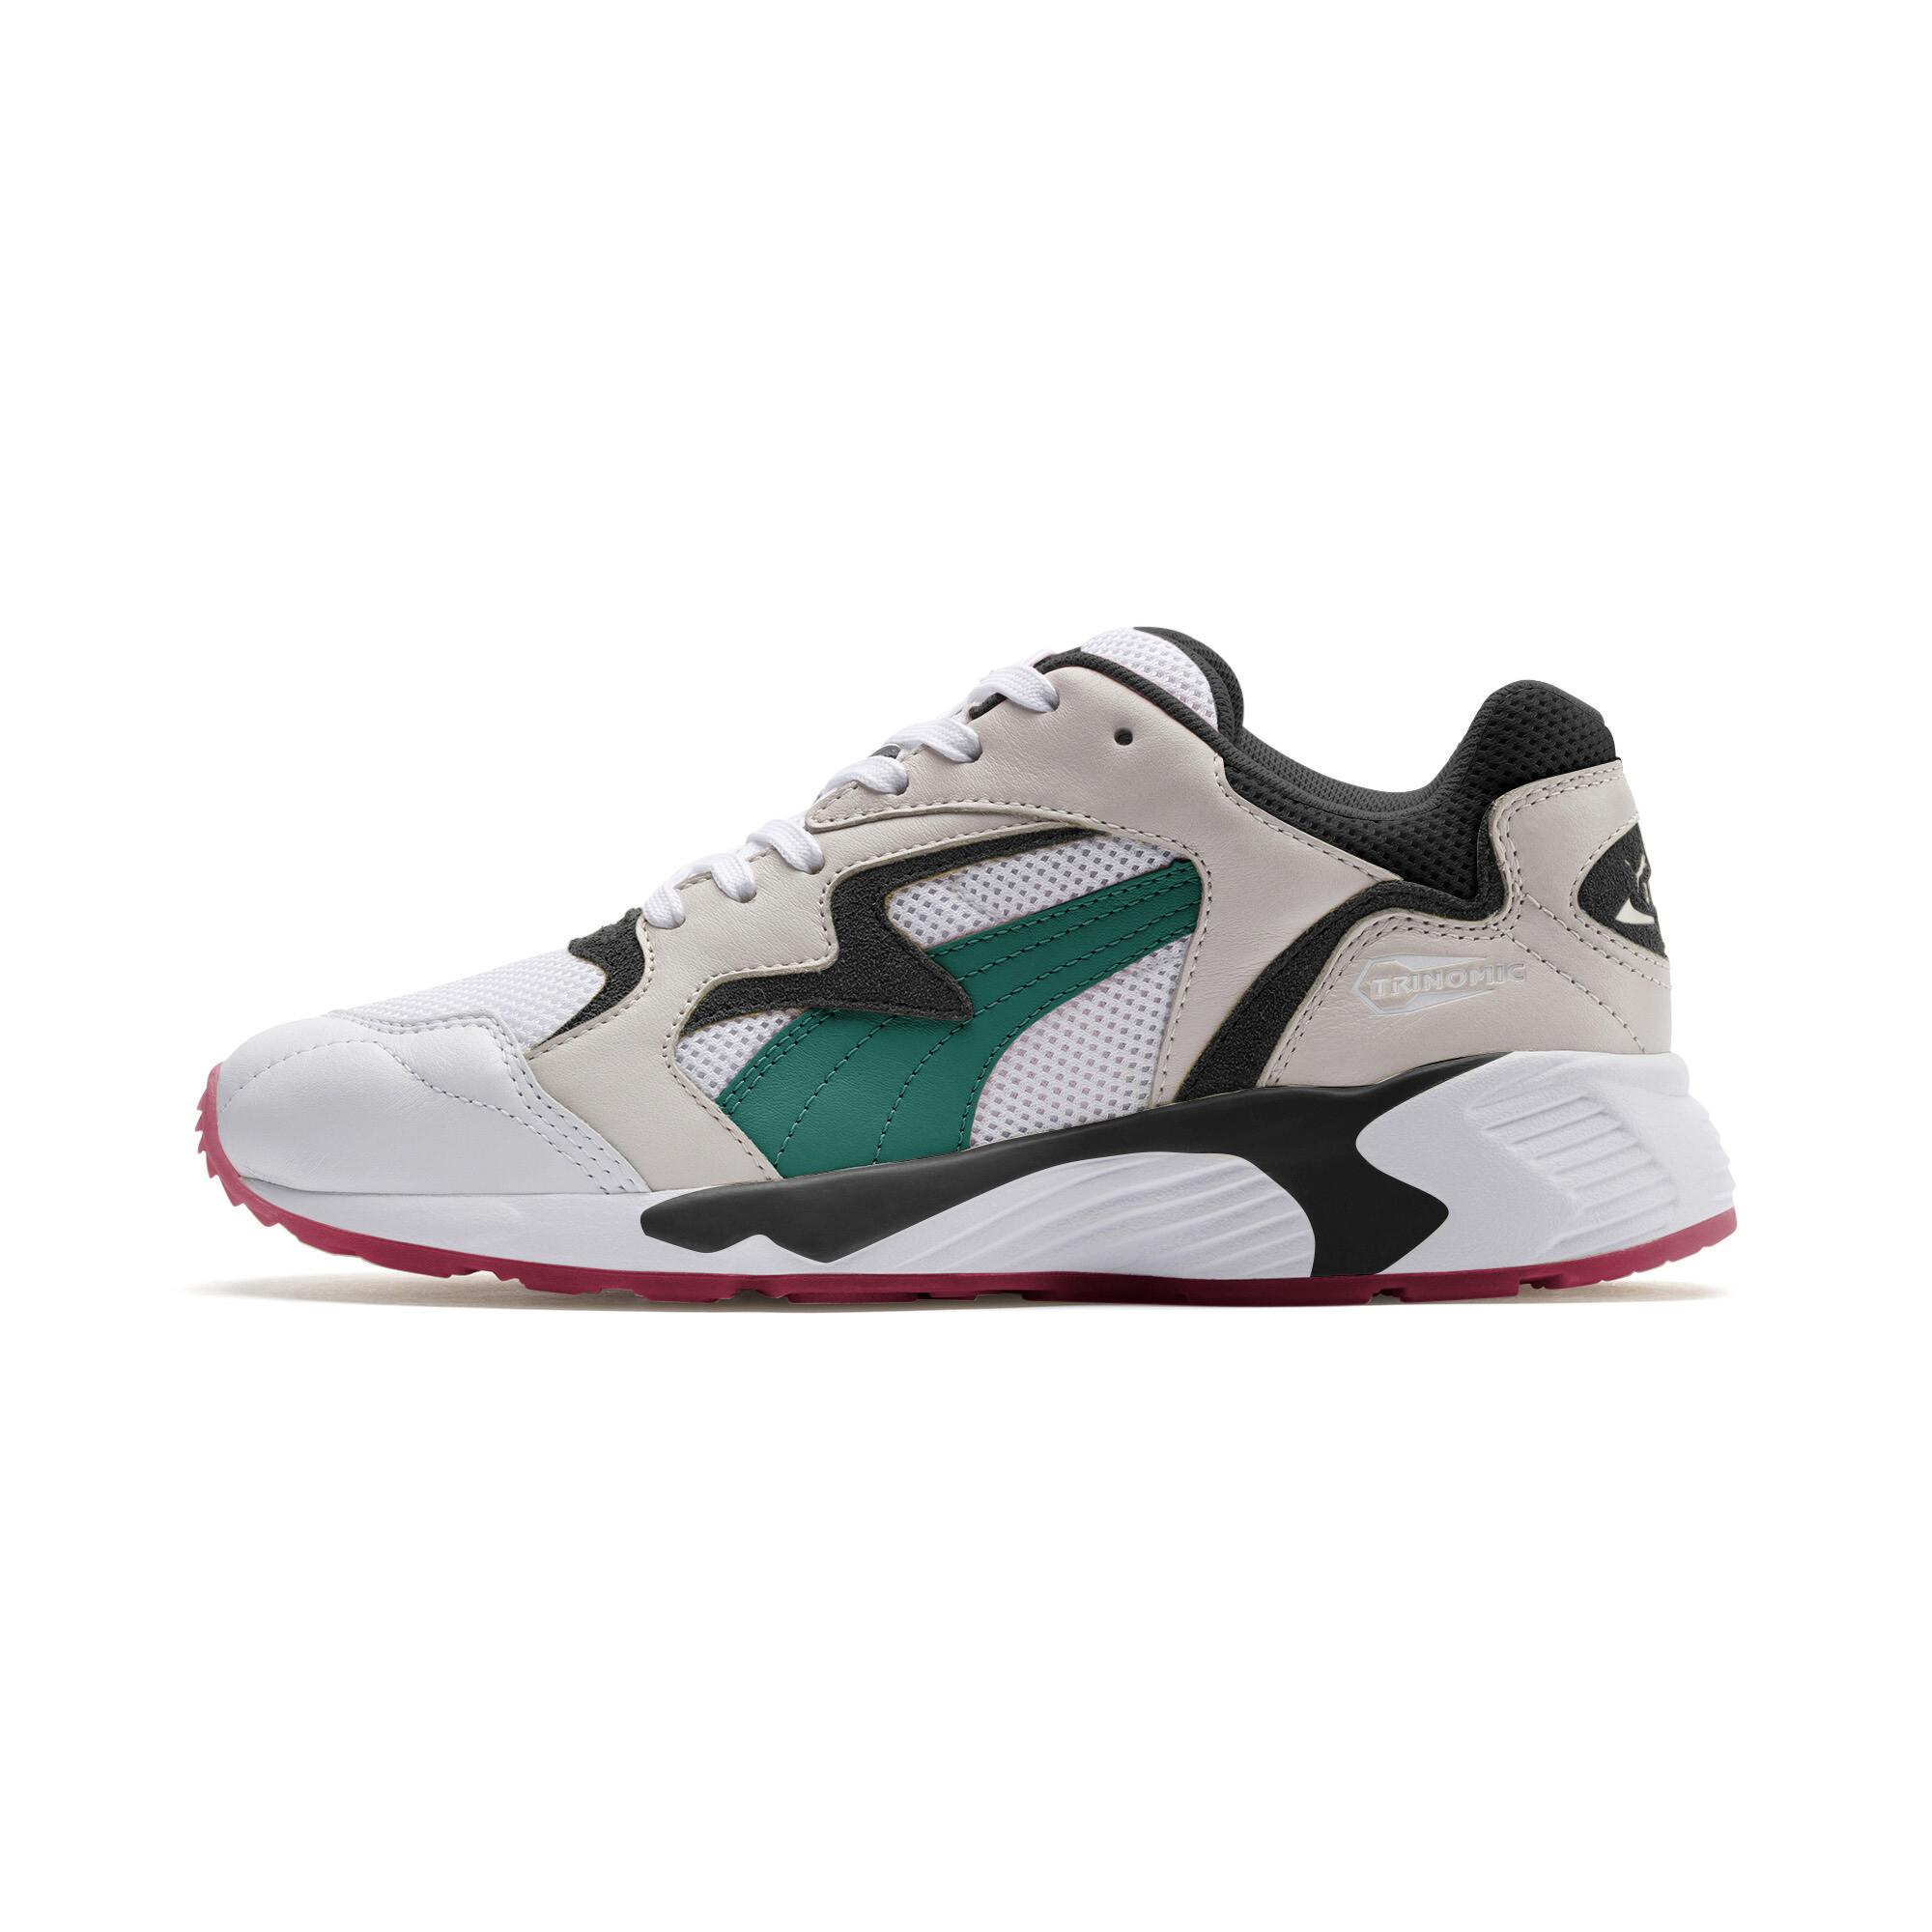 PUMA-Prevail-Classic-Sneakers-Unisex-Shoe thumbnail 10